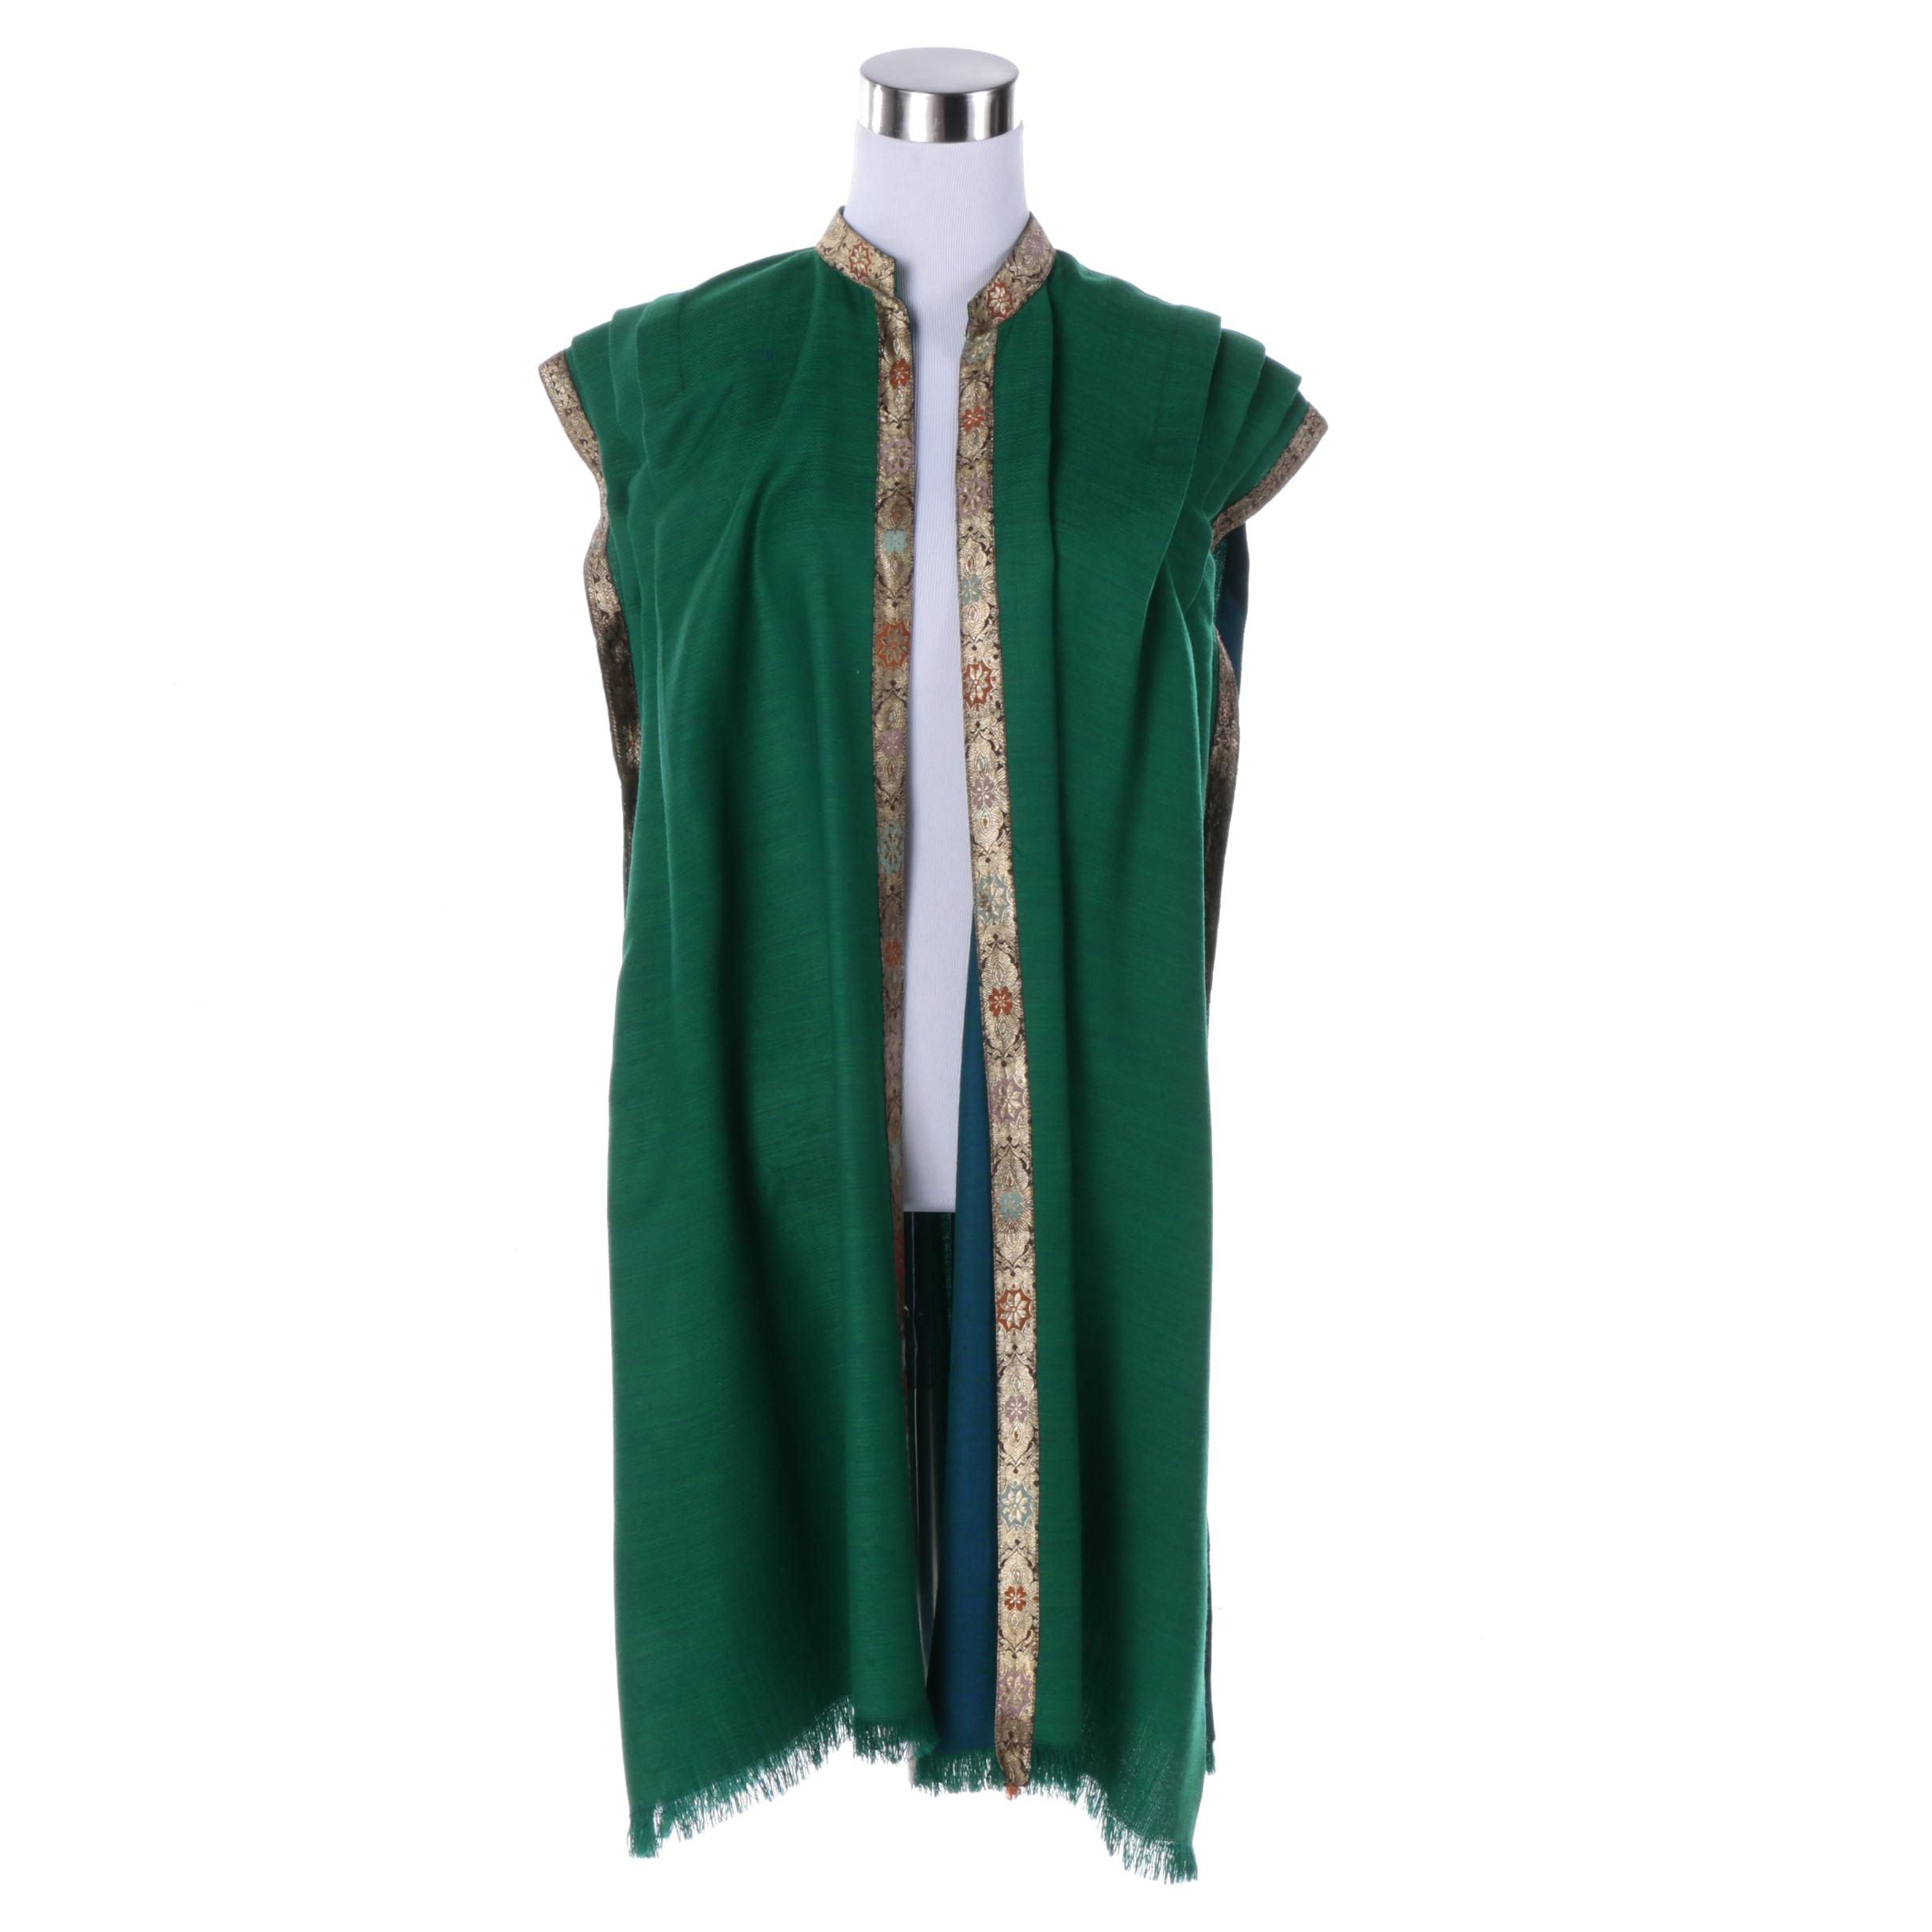 Women's Tunic Vest with Ribbon Trim